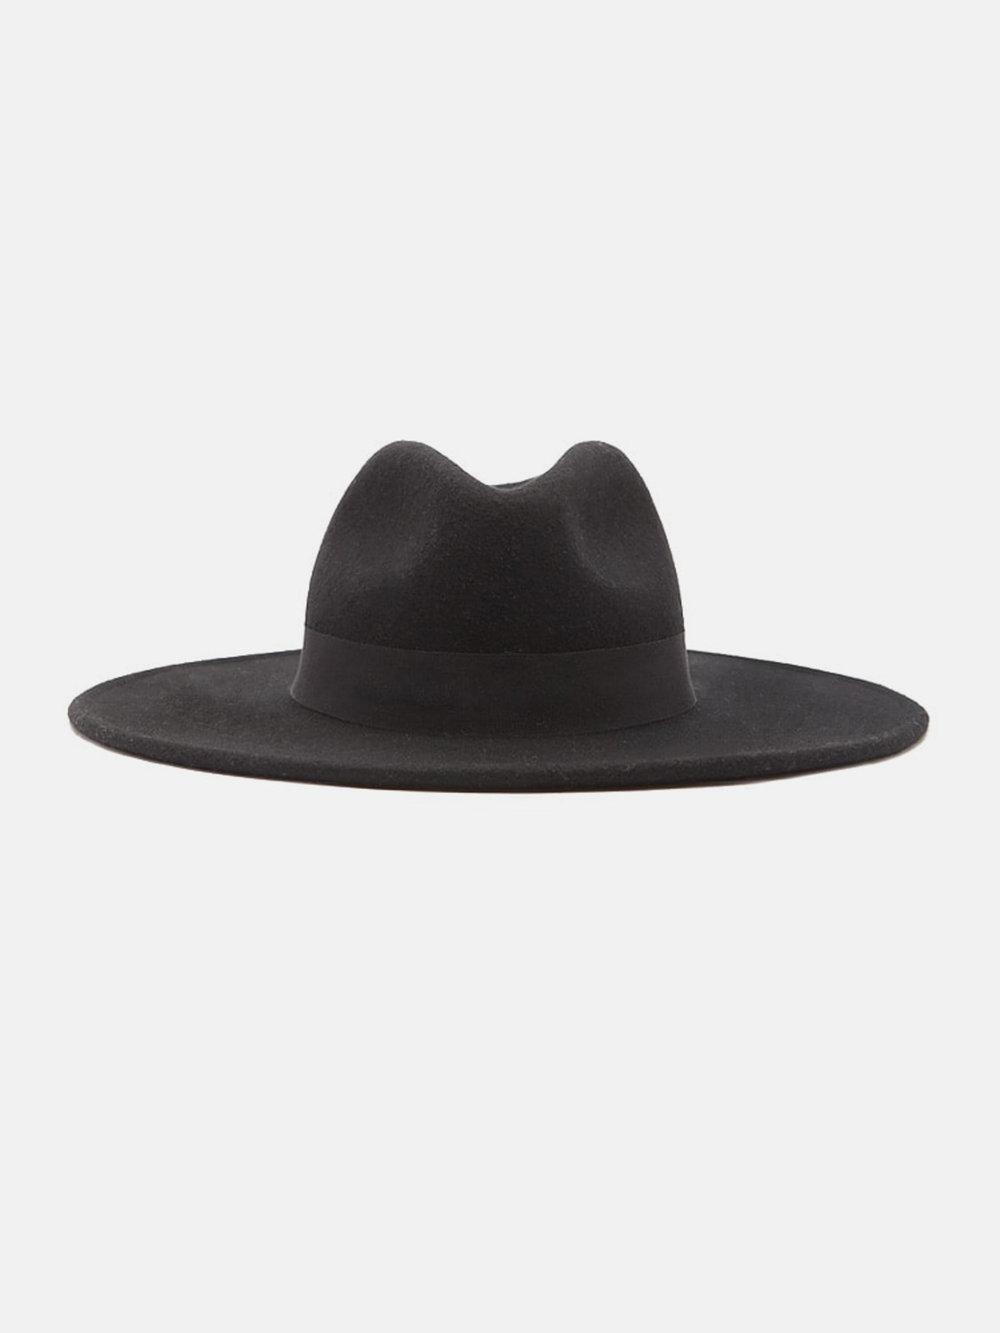 Wool Wide-Brim Fedora, $22.90